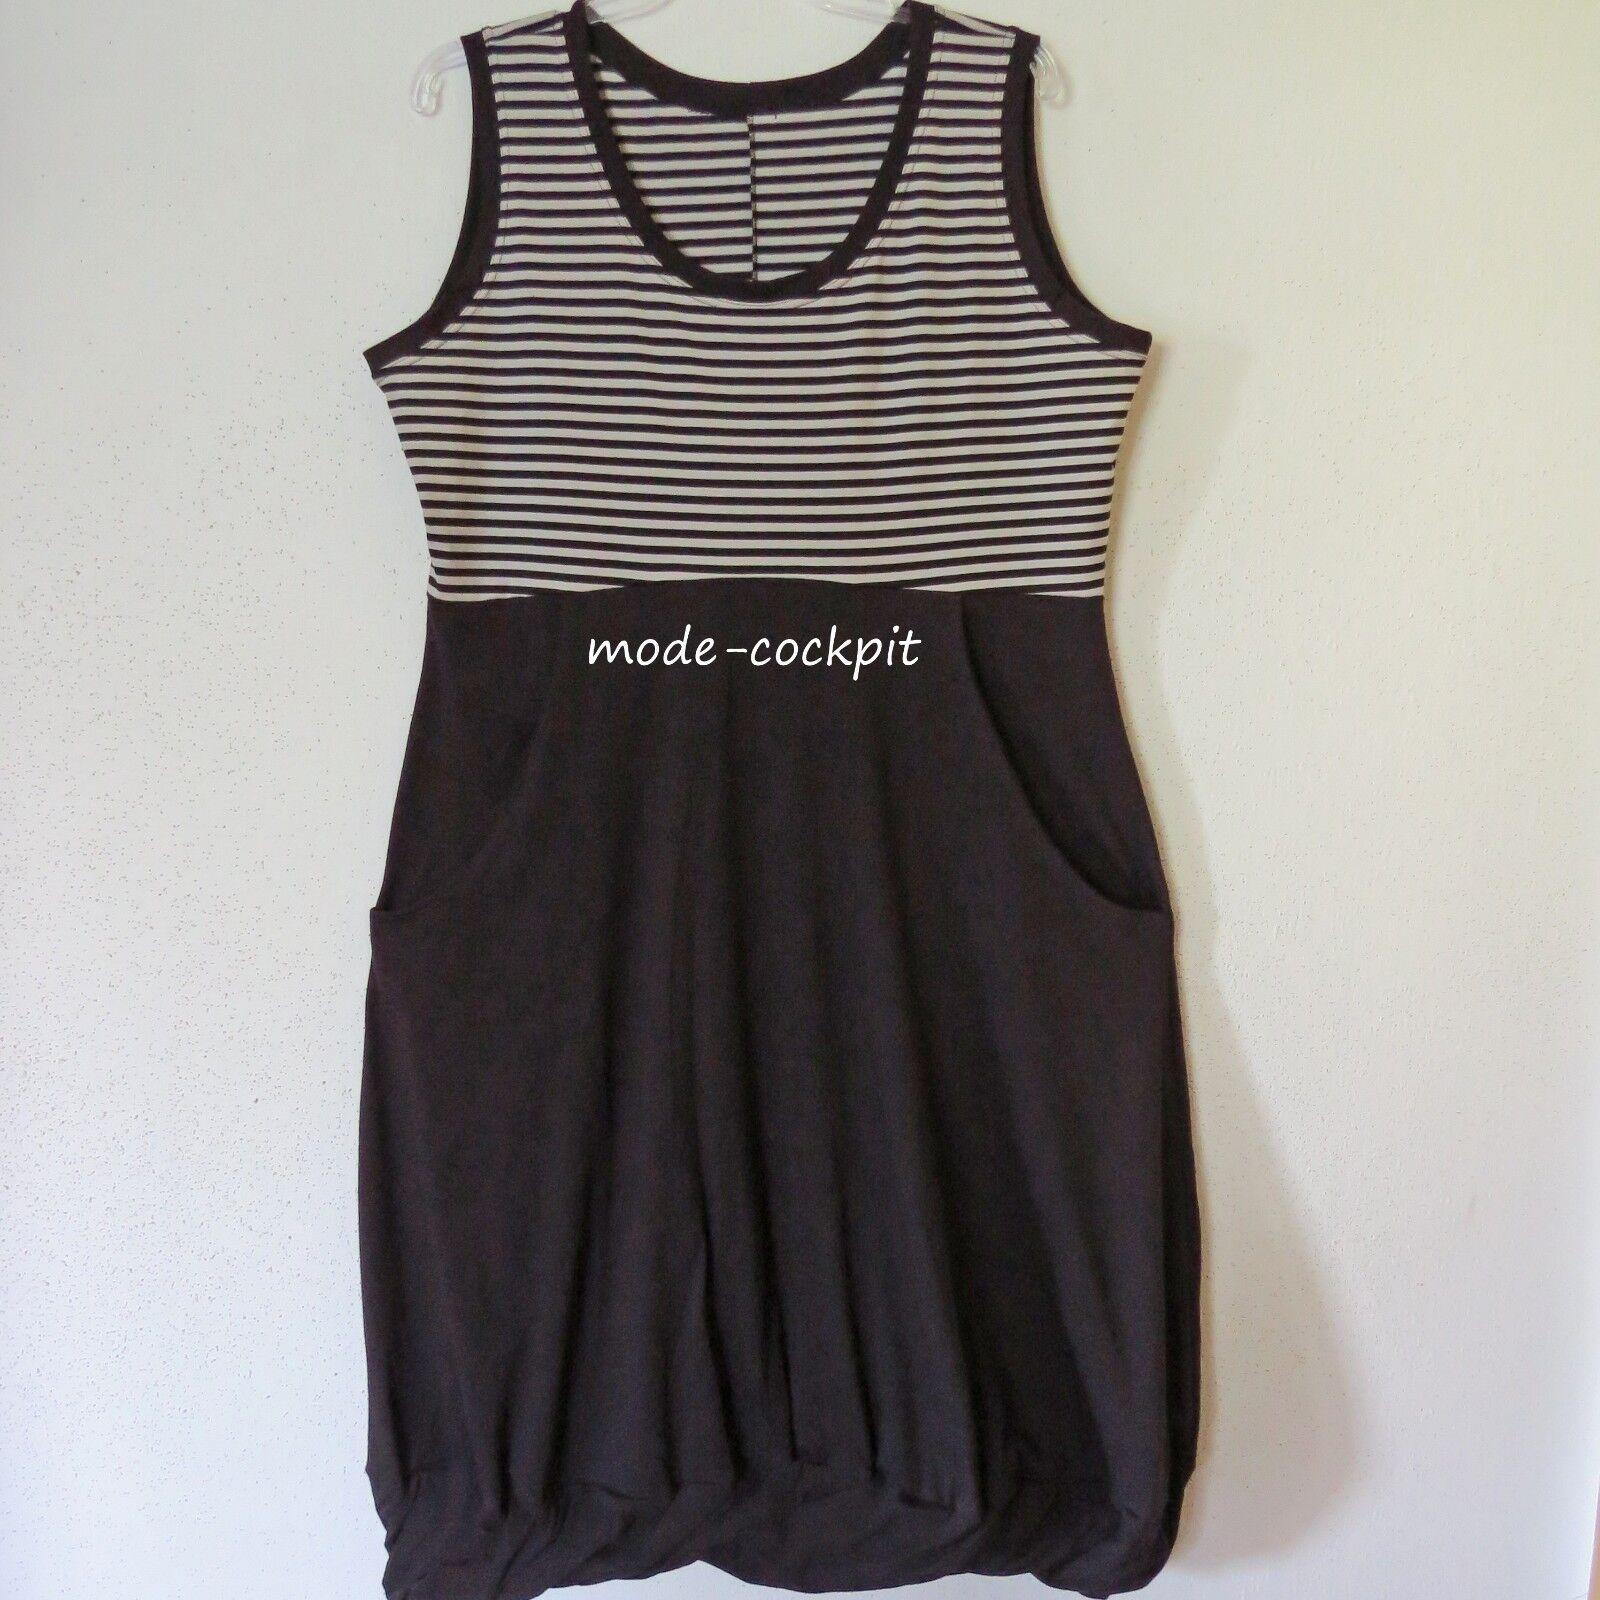 BORIS INDUSTRIES Träger Shirt Kleid gedrehter Saum schwarz-silbergrau 48 (5)